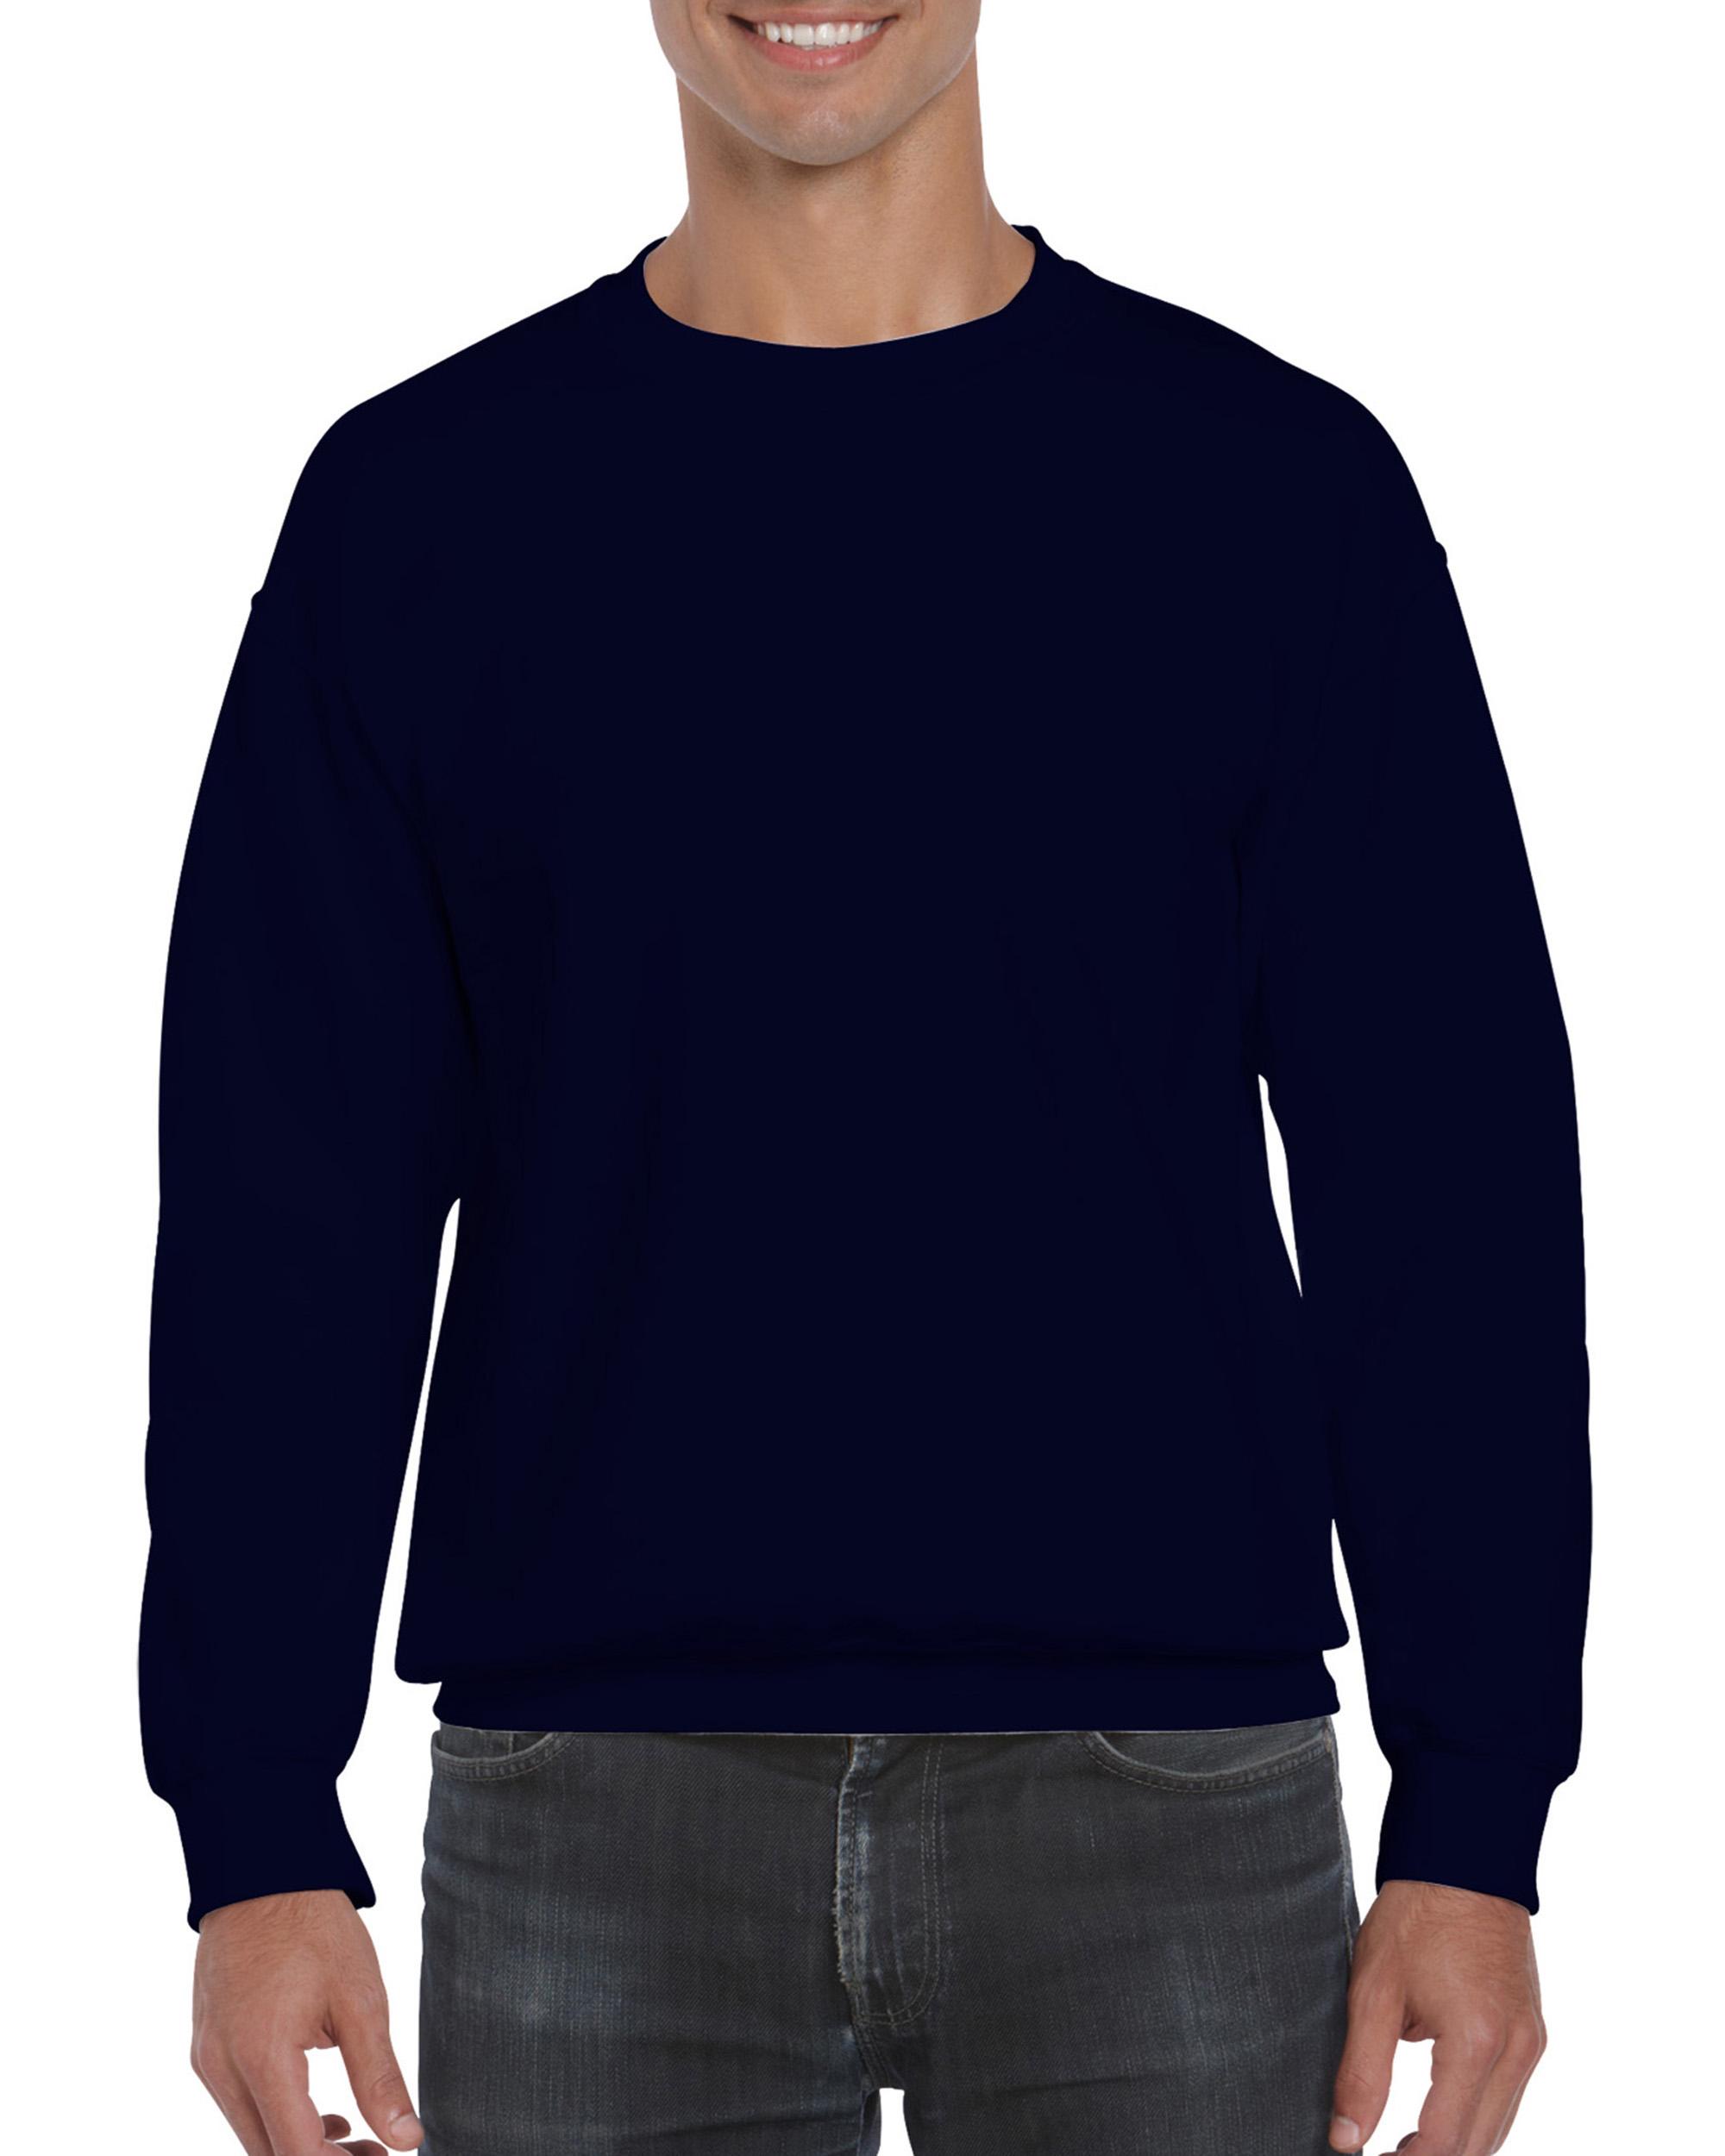 Gildan GI12000 - Sweat-Shirt Homme Manches Droites   Wordans France 07b9cb459072